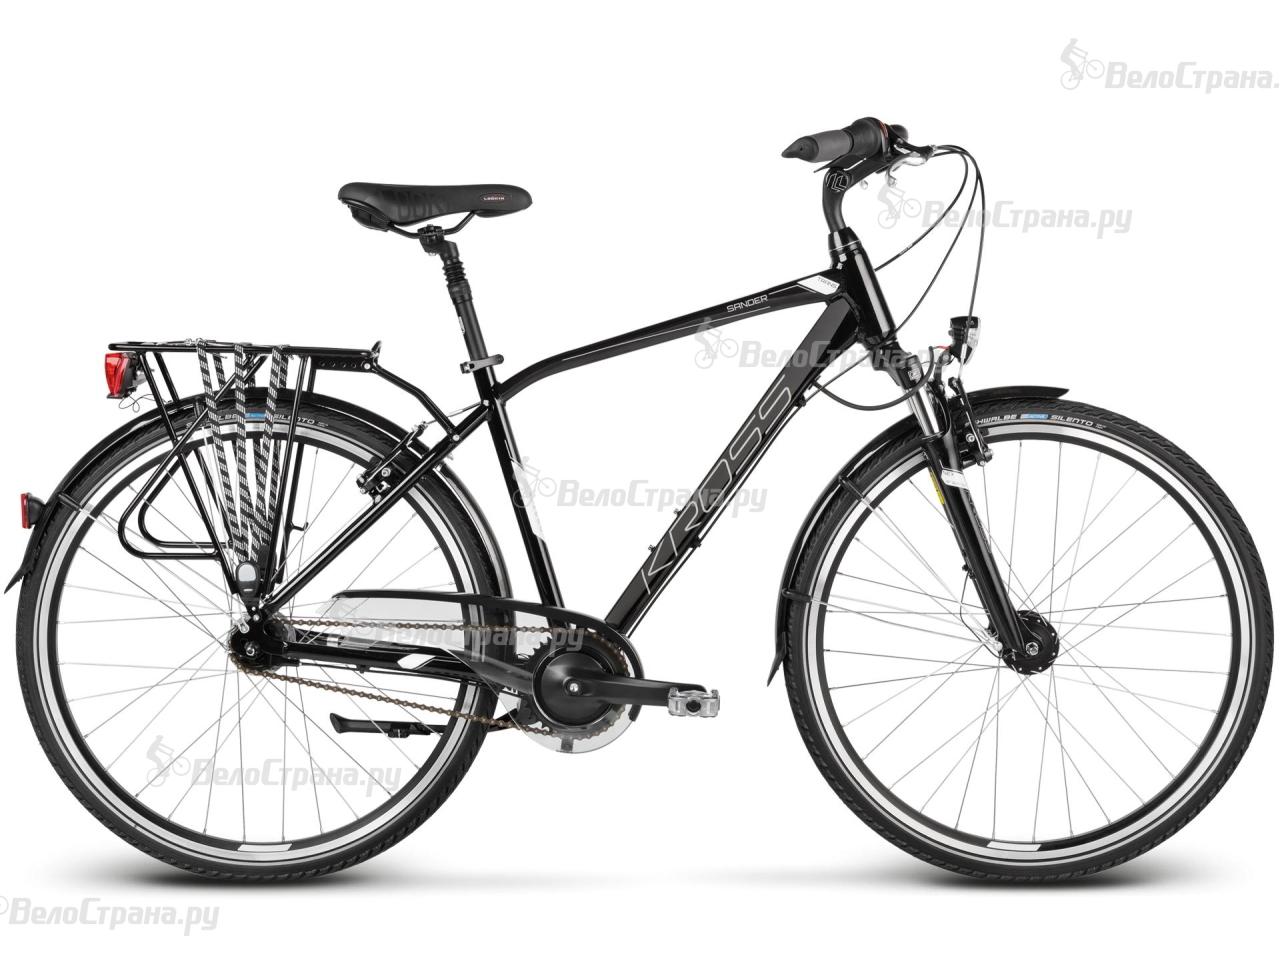 Велосипед Kross Trans Sander (2017) велосипед kross trans sander 2015